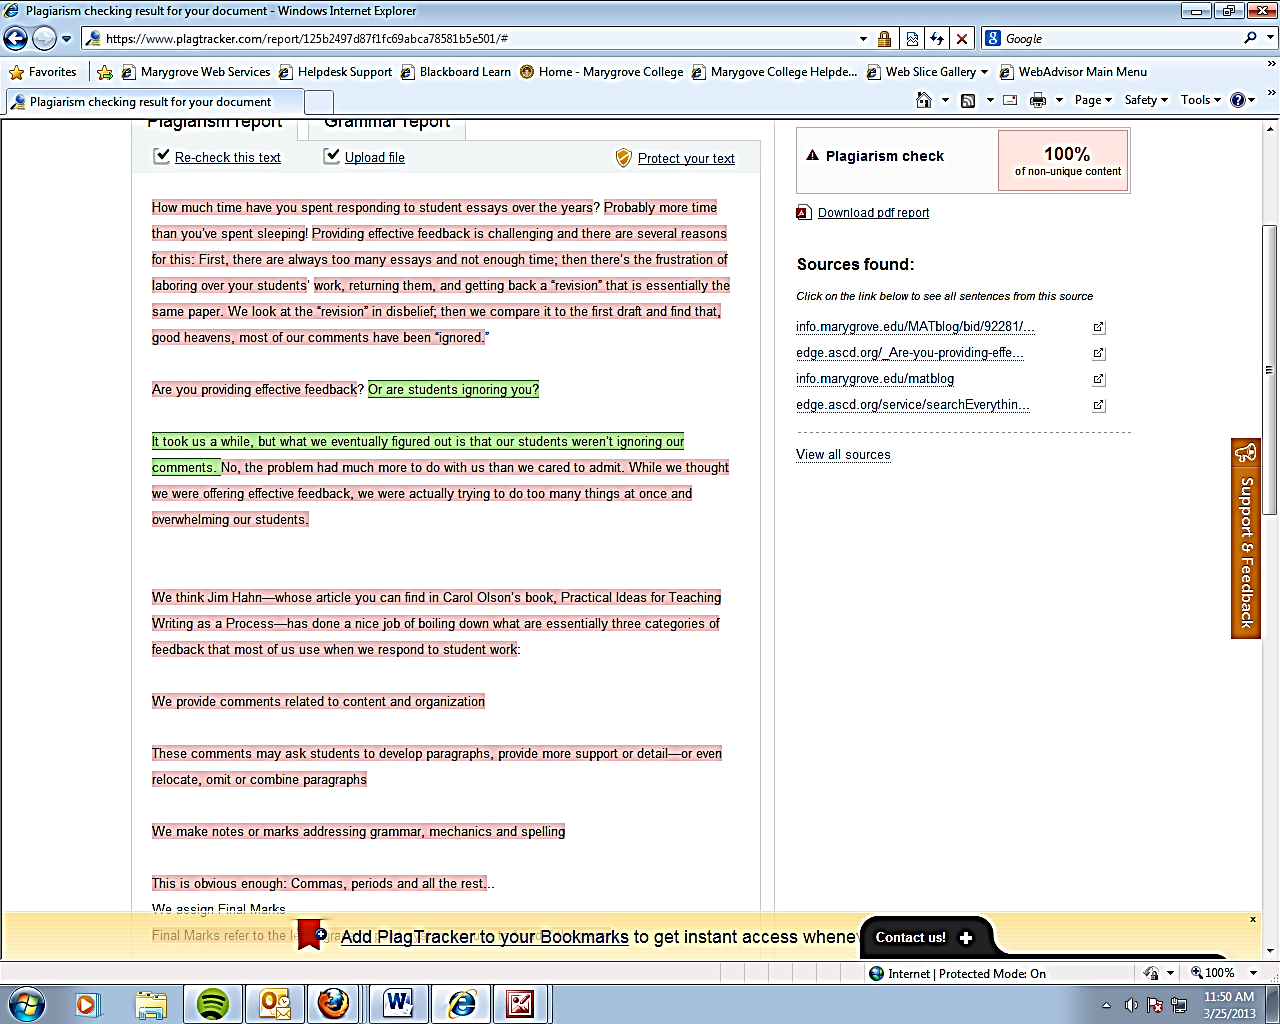 006 Essay Checker Free Online Amazing Sentence Grammar Plagiarism Document Full